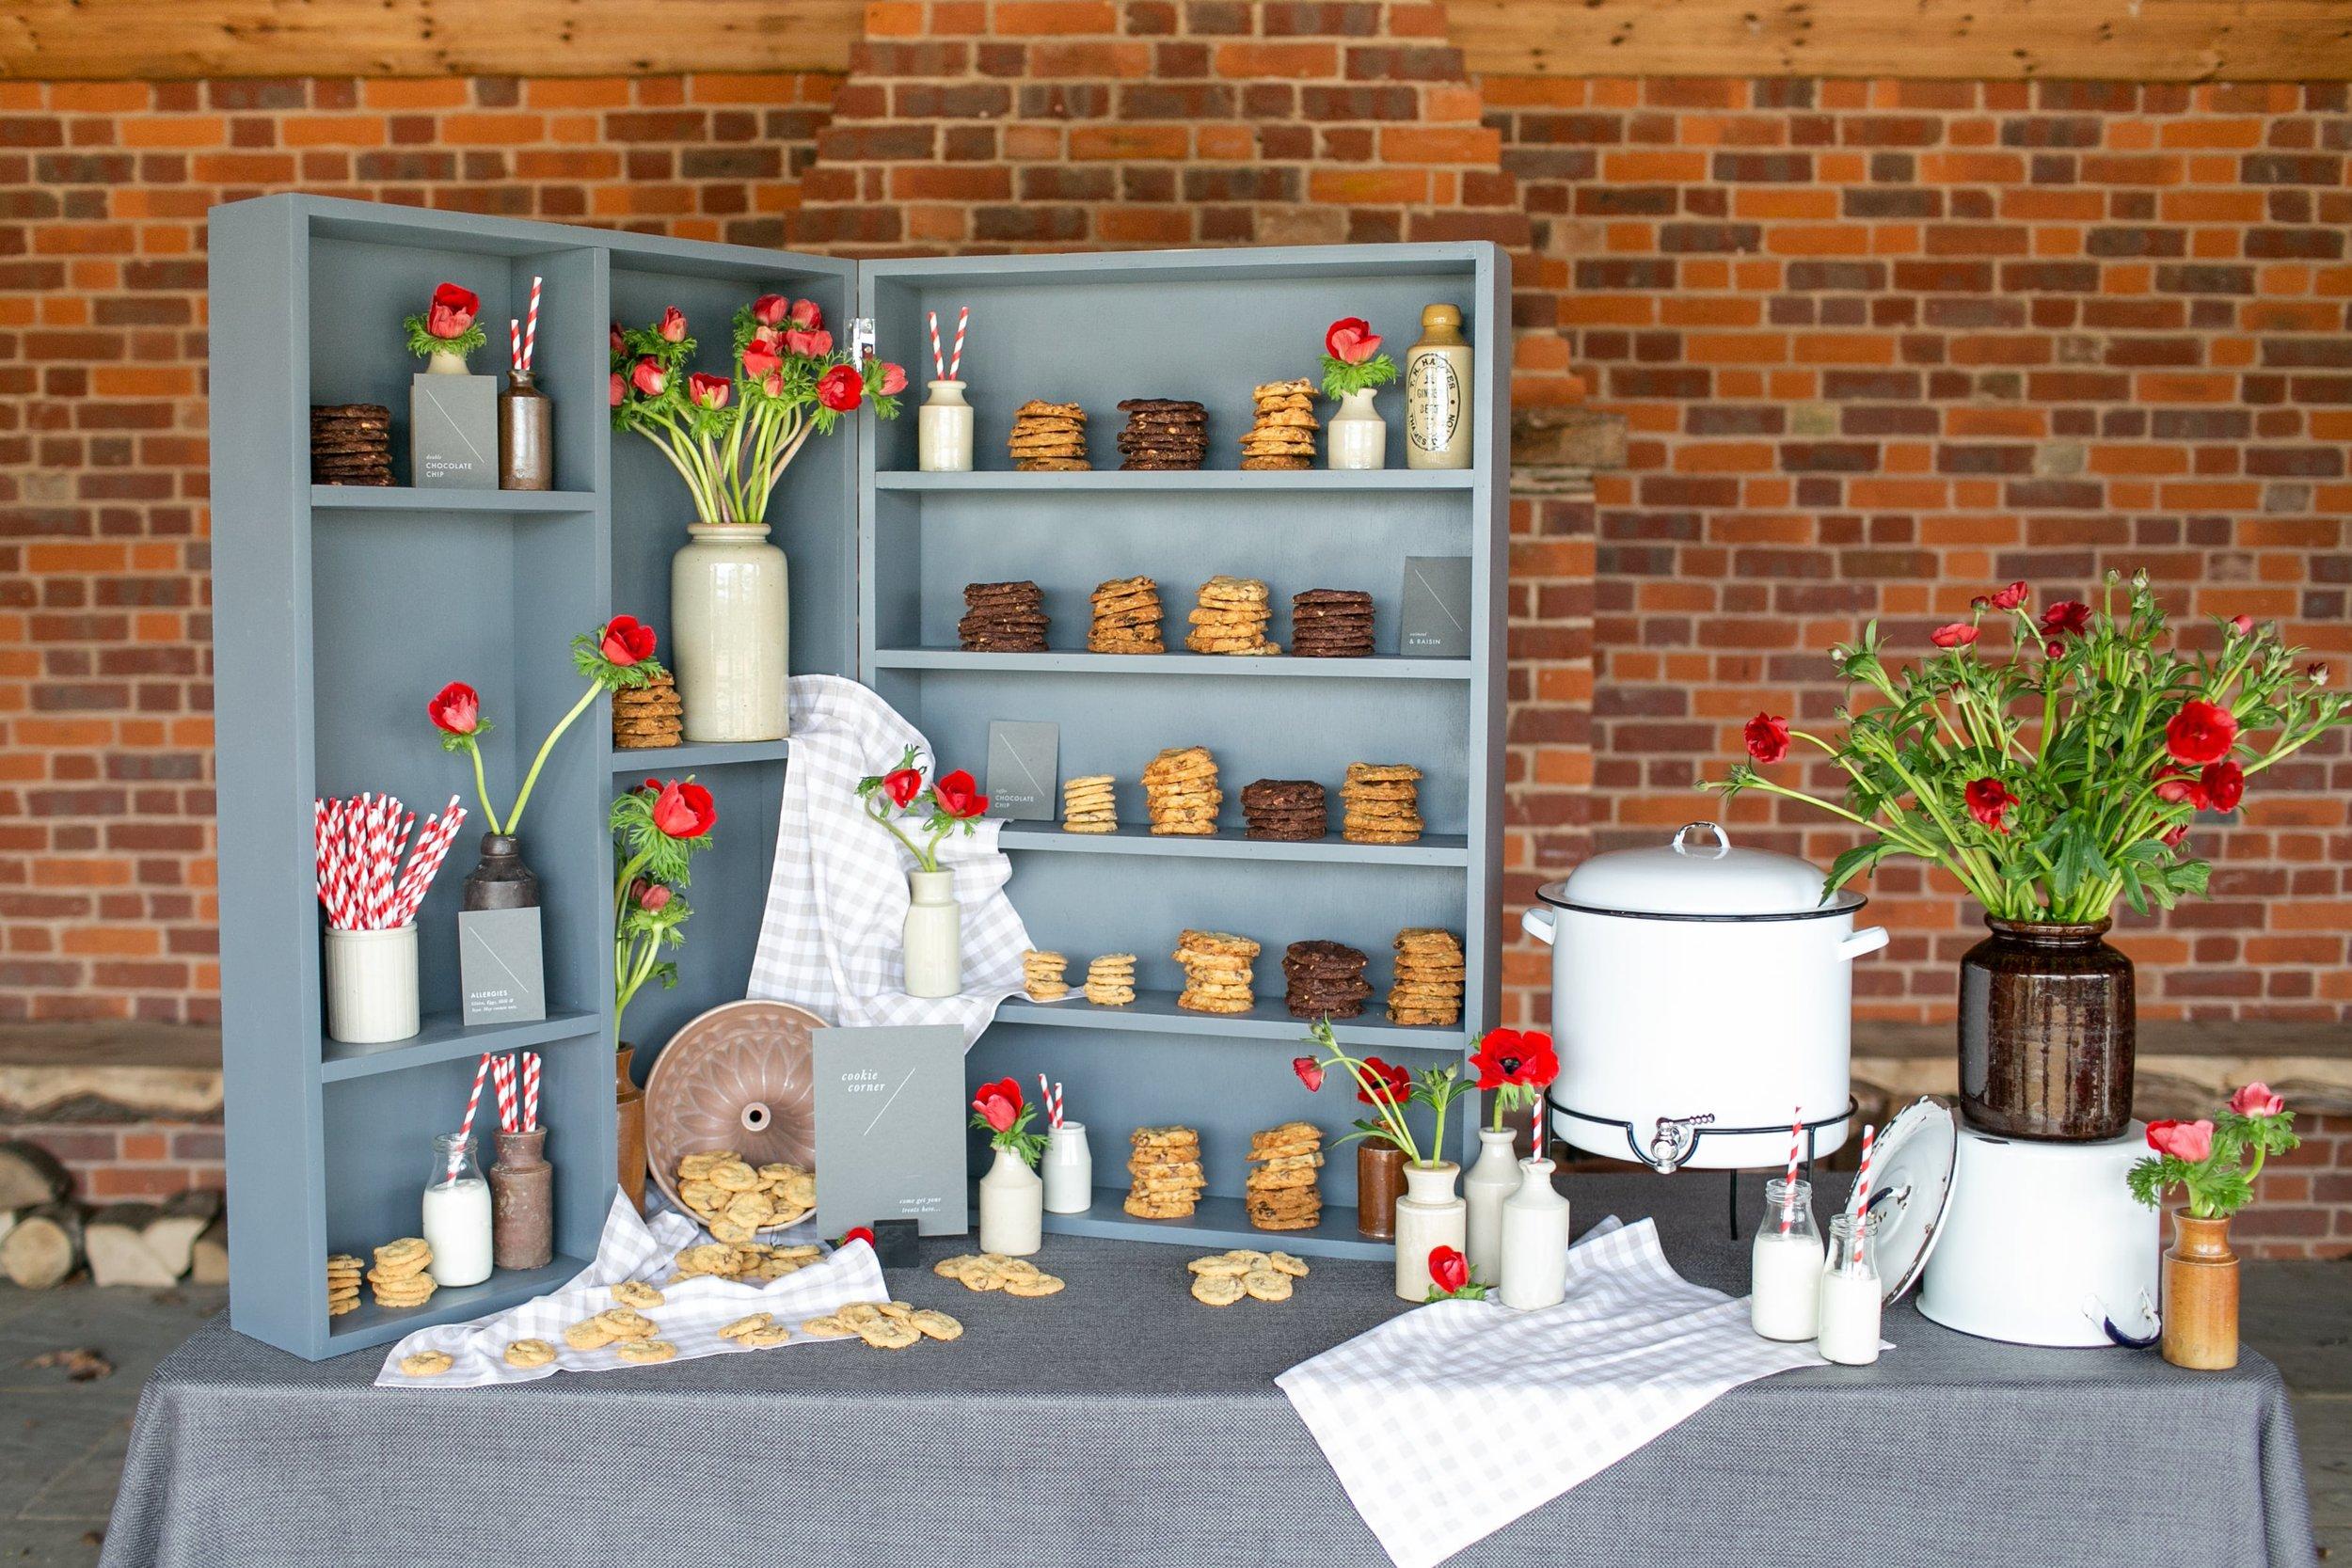 Kalm-Kitchen-Food-Stations-Anneli-Marinovich-12-min.jpg